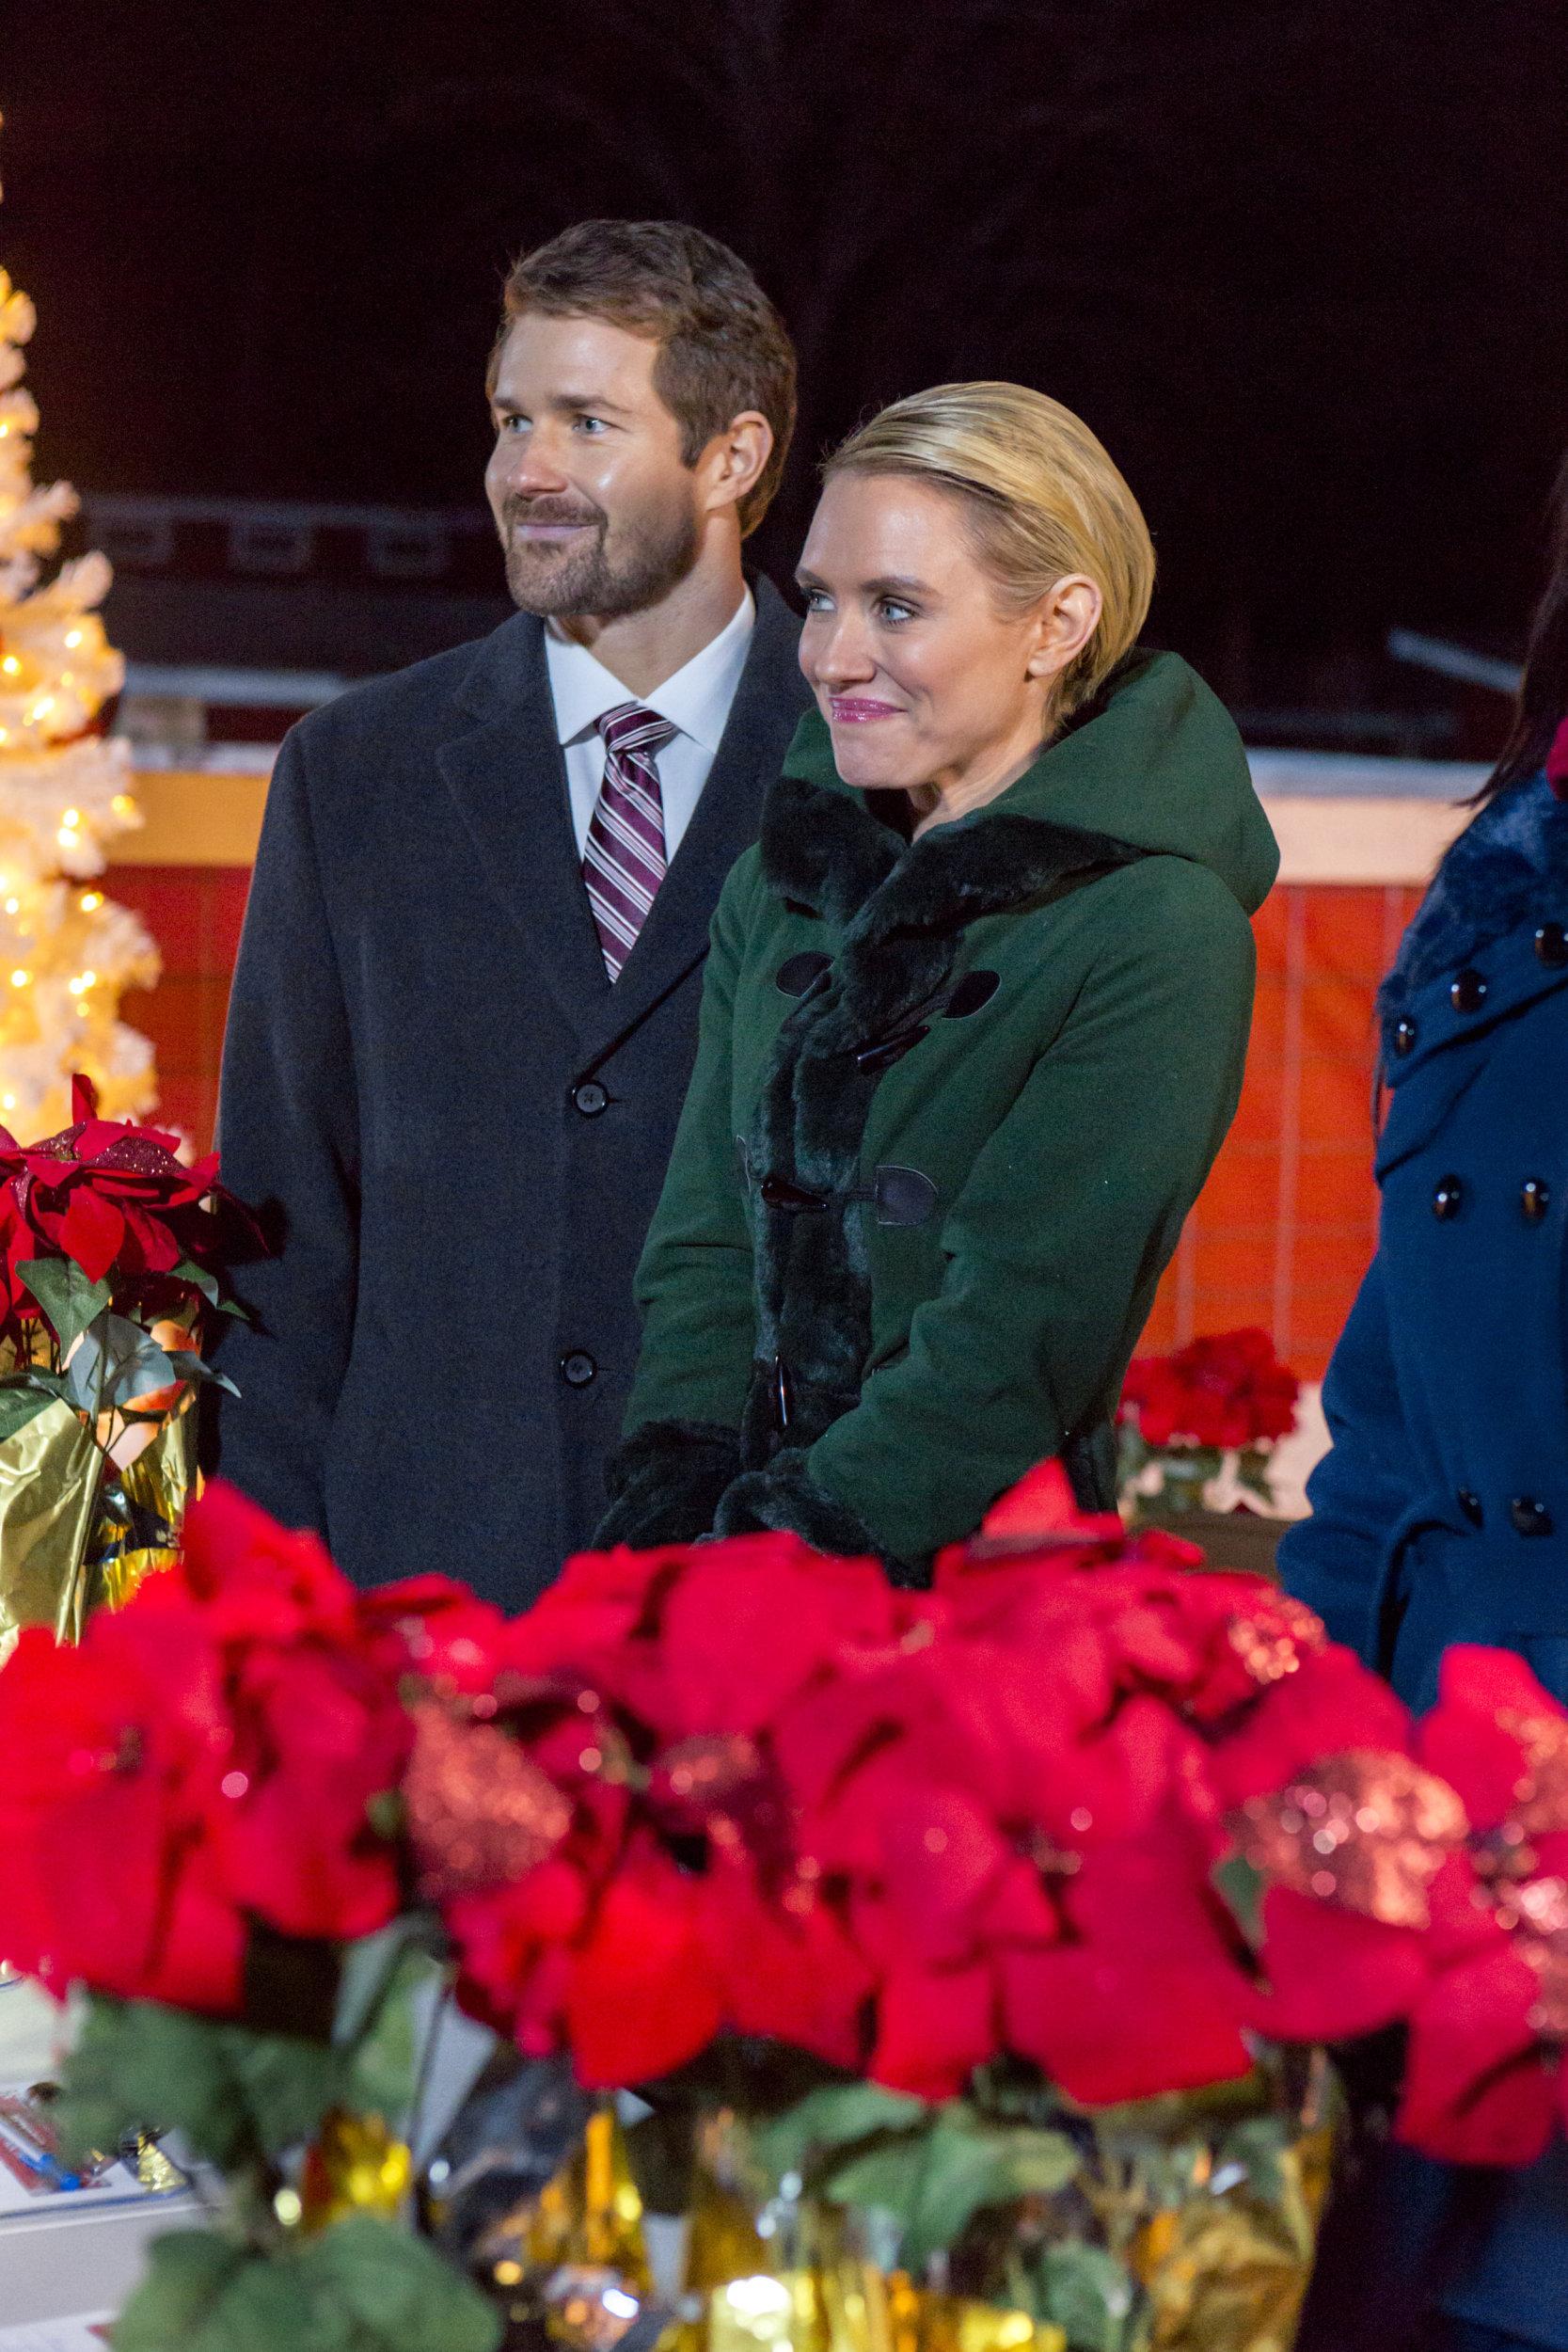 Romance at Reindeer Lodge  Cast  Hallmark Movies and